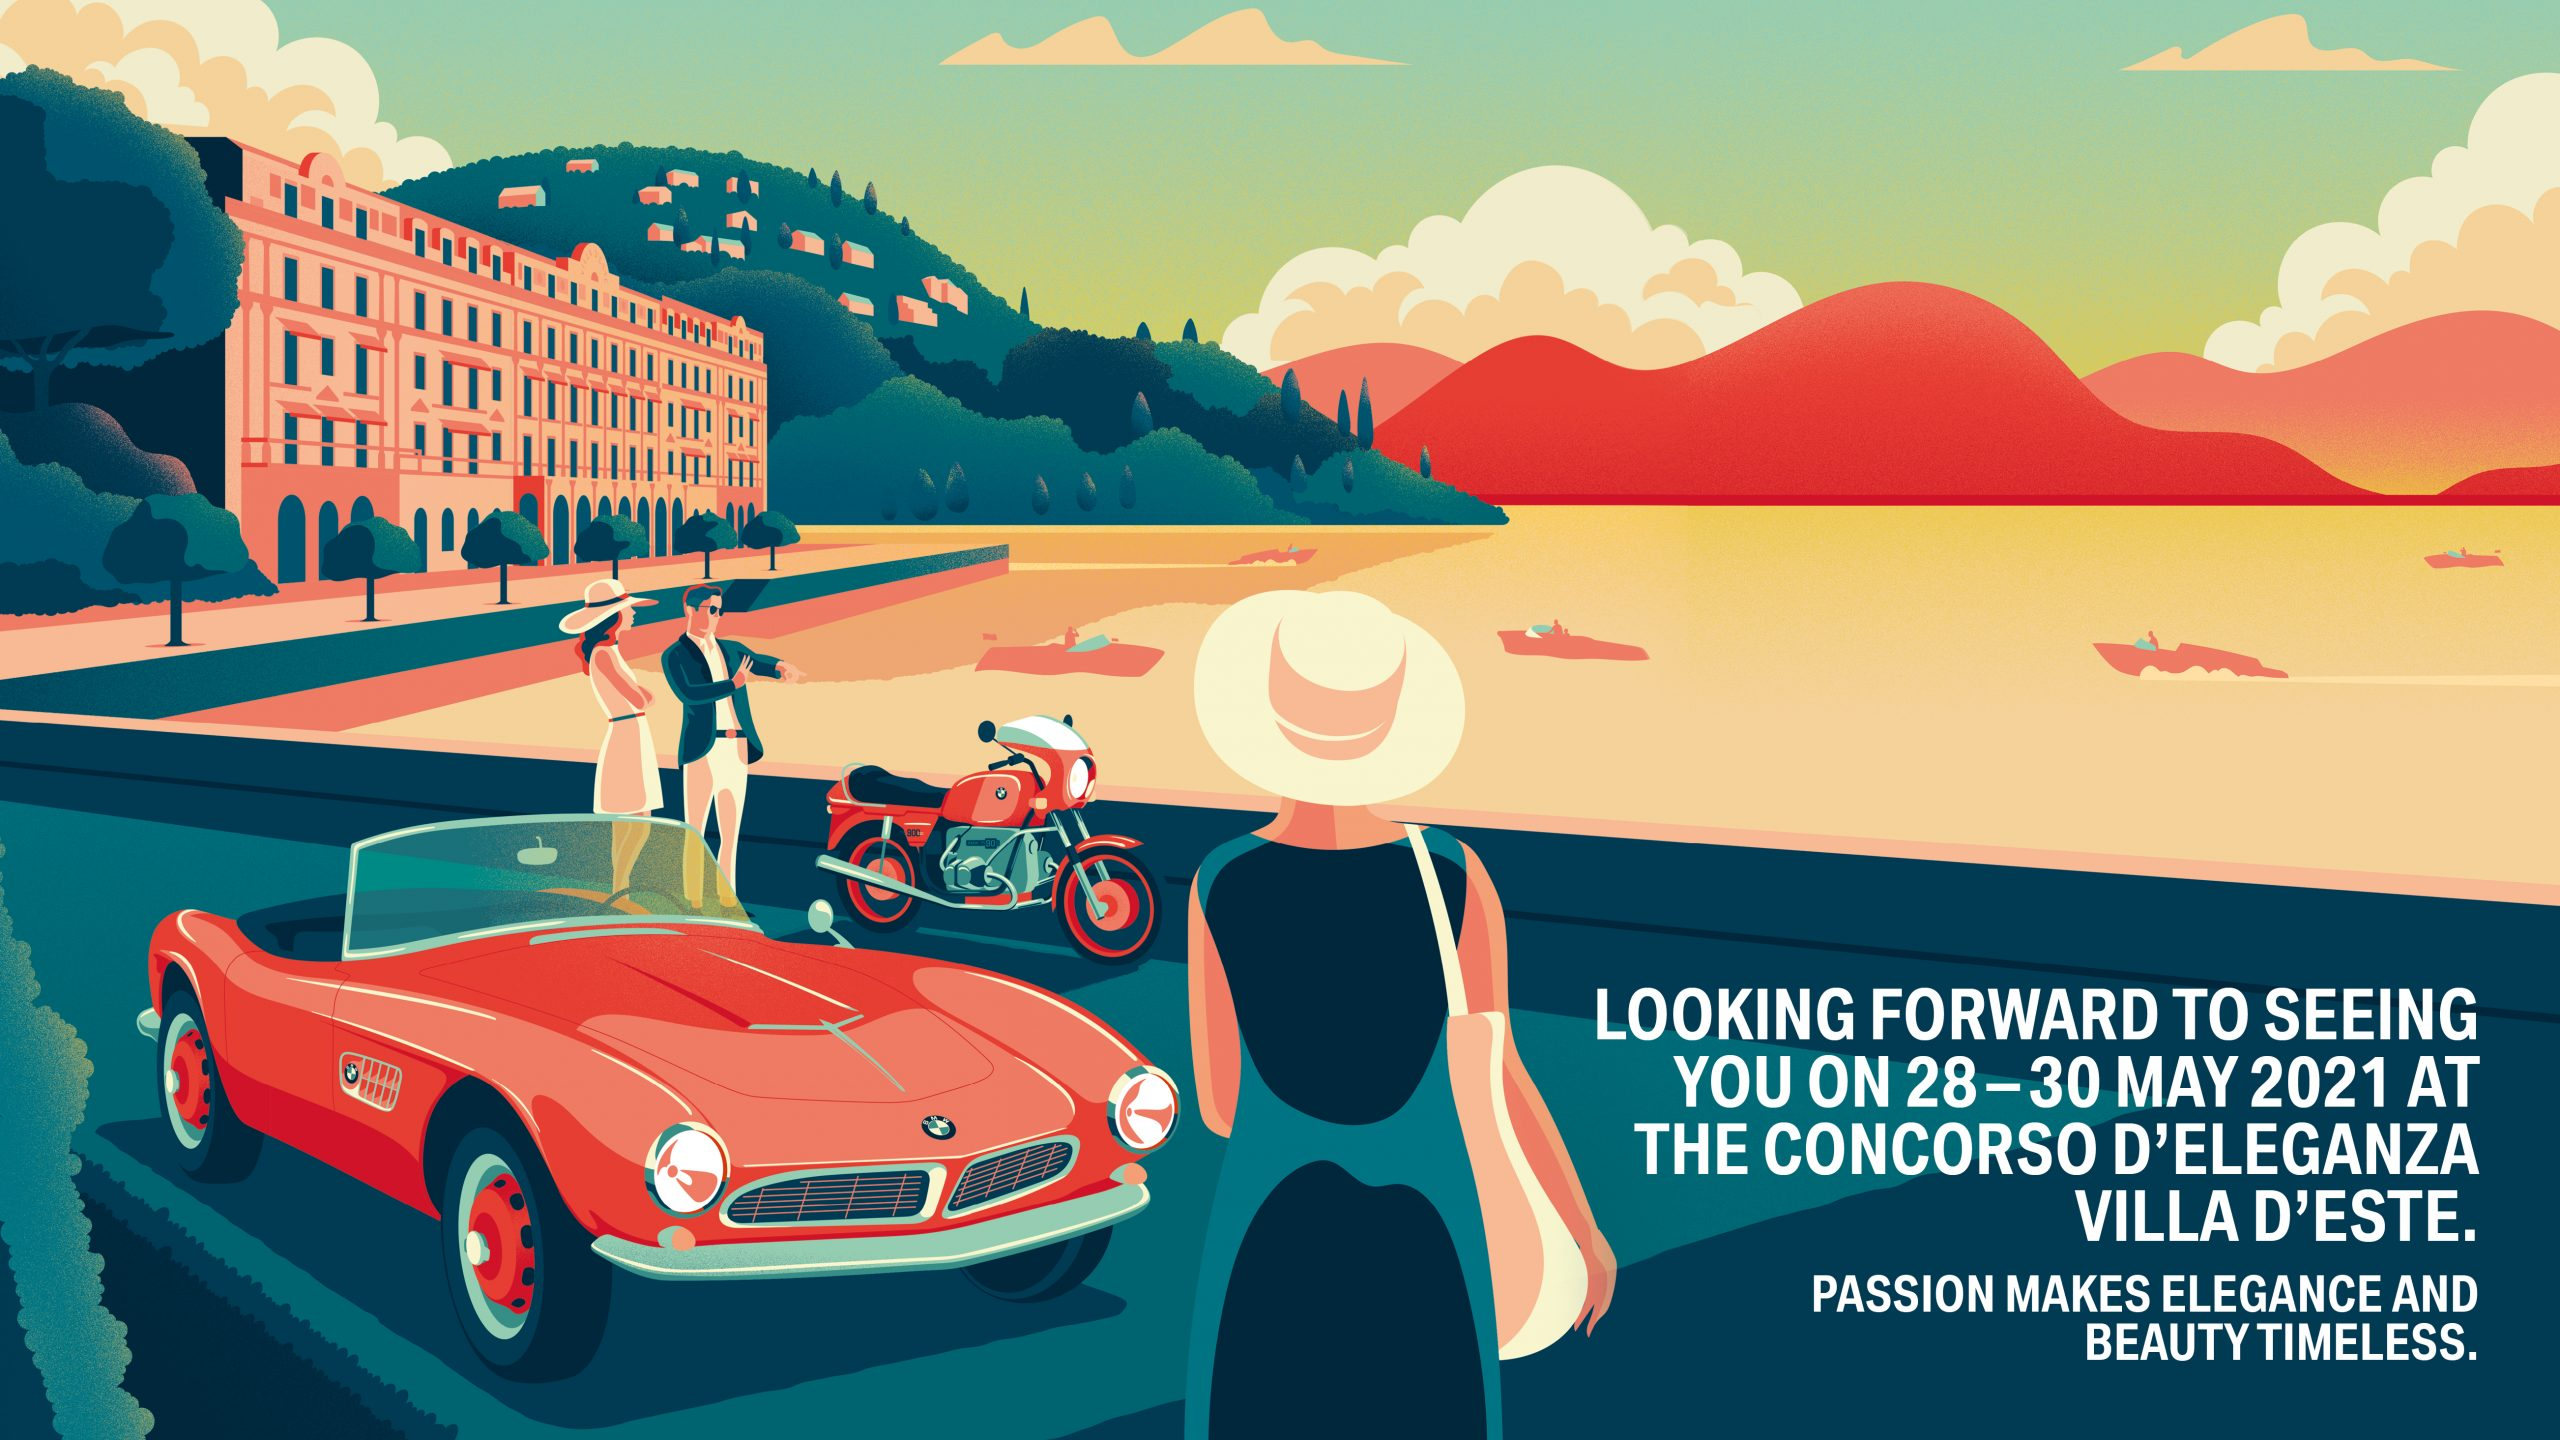 p90393804-highres-passion-makes-elegan-scaled